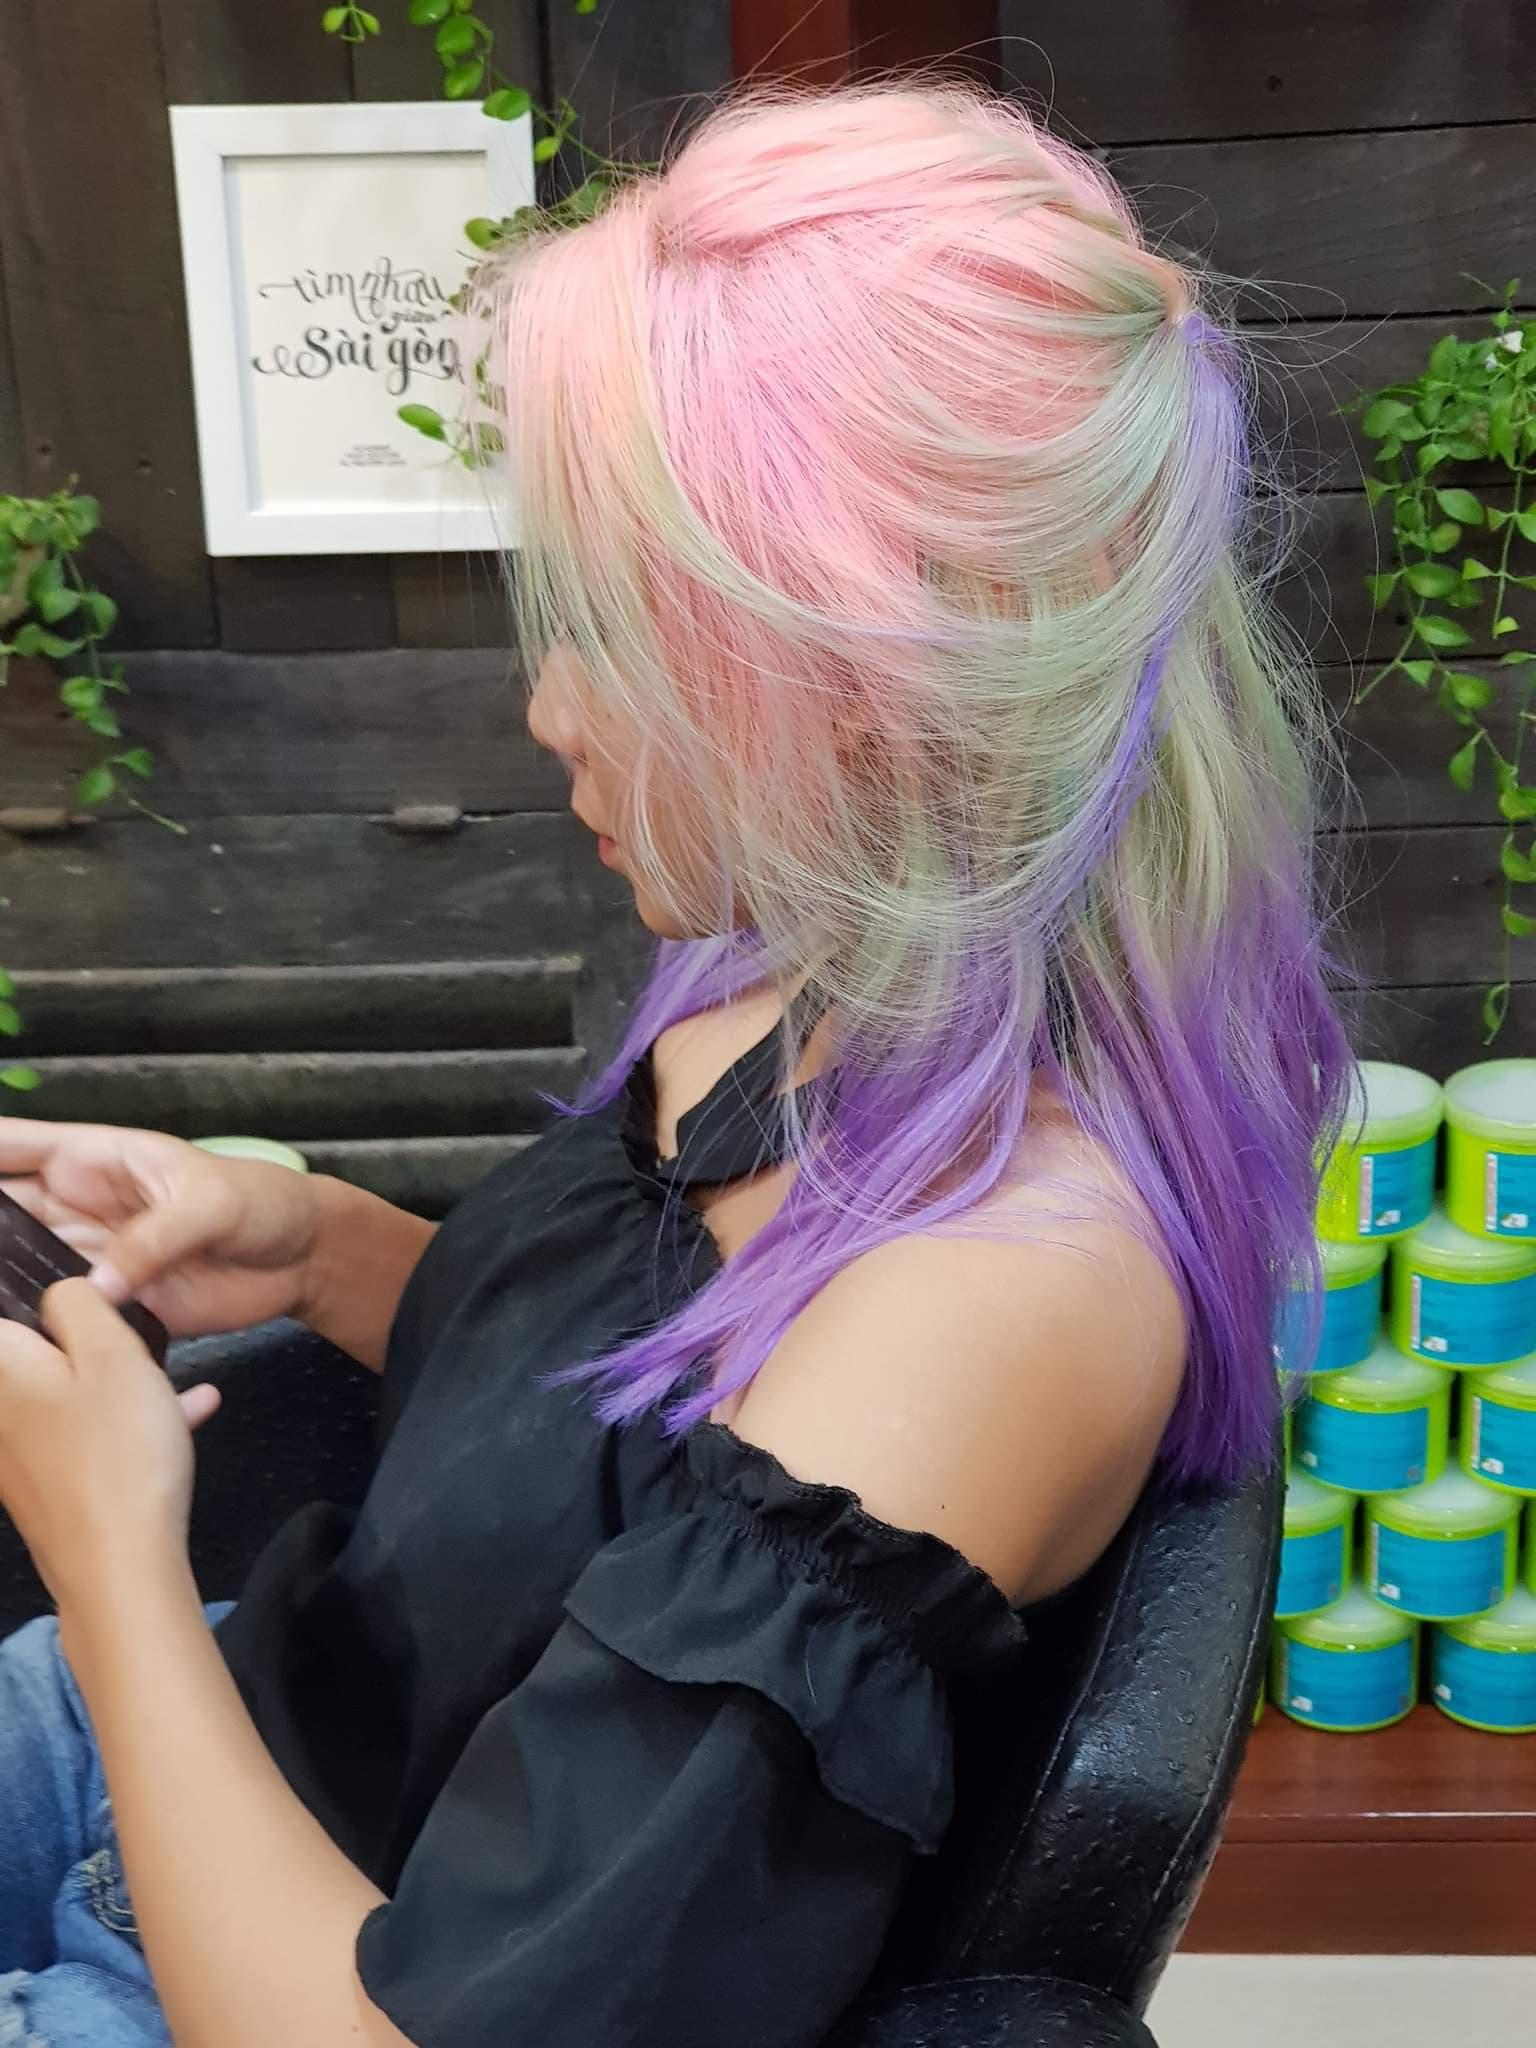 HCM - Labella Hair Beauty Salon - Voucher Tặng 19.000đ Combo Uốn/Duỗi/Nhuộm + Hấp Collagen Đang Có Khuyến Mãi